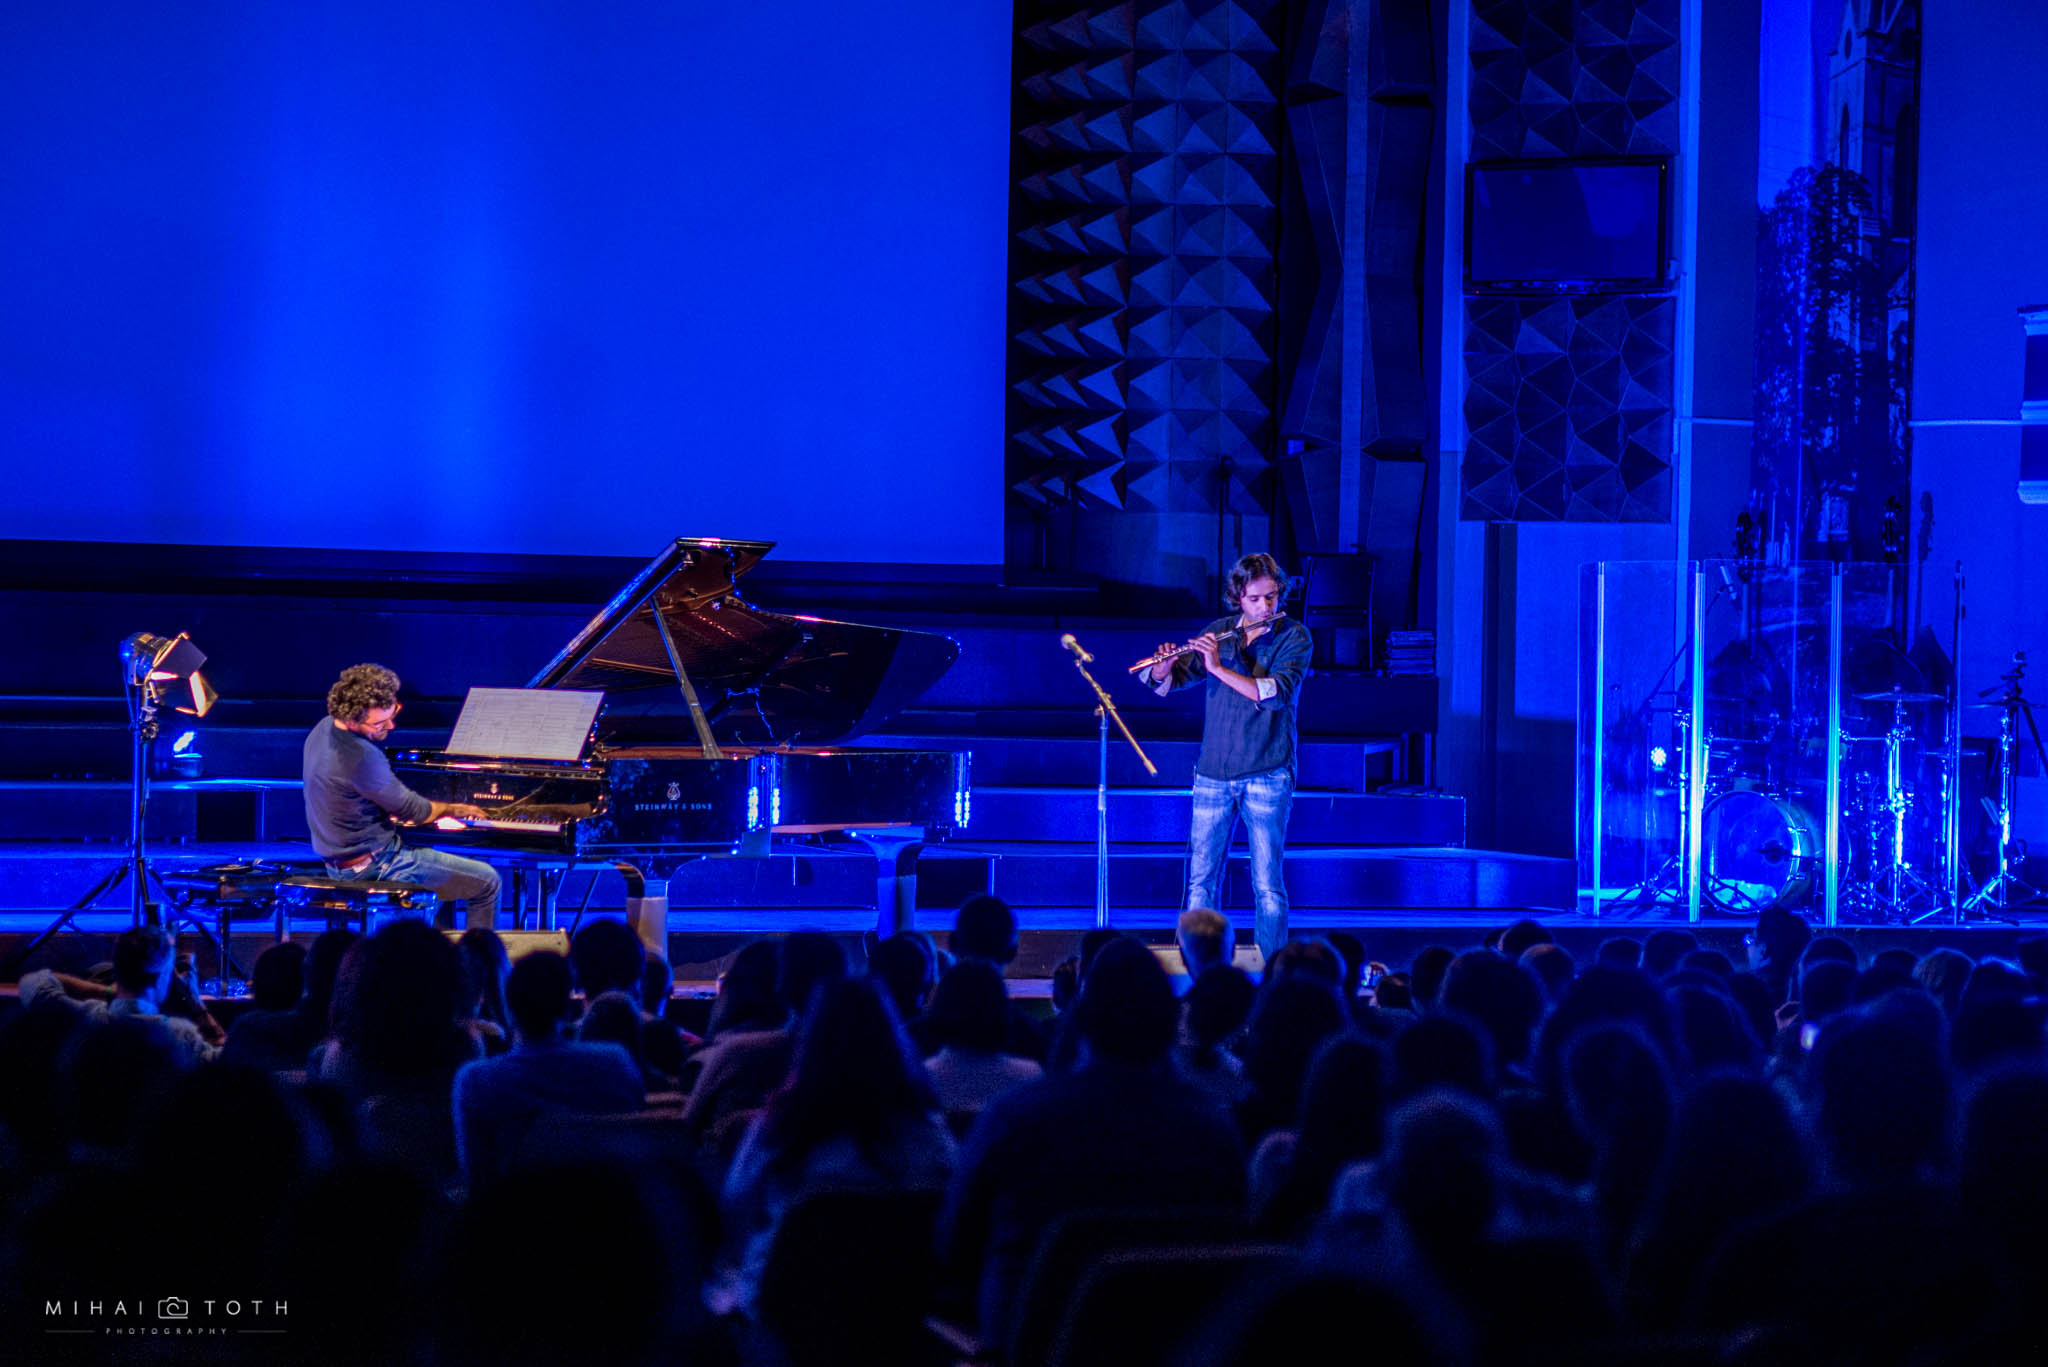 Pianist Teo Milea performing at Timisoara Philharmonic Hall | New Album Release 'Open Minds' (2016)